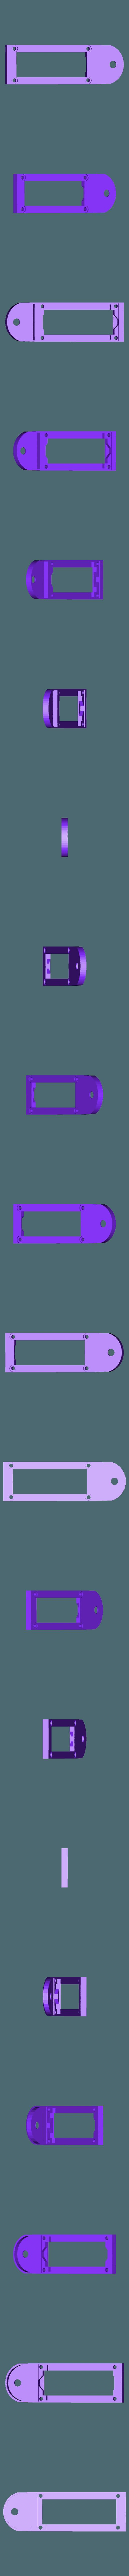 Lid.stl Download free STL file Arduino Uno Slider w/ 2x16 LCD • Design to 3D print, NHiggs